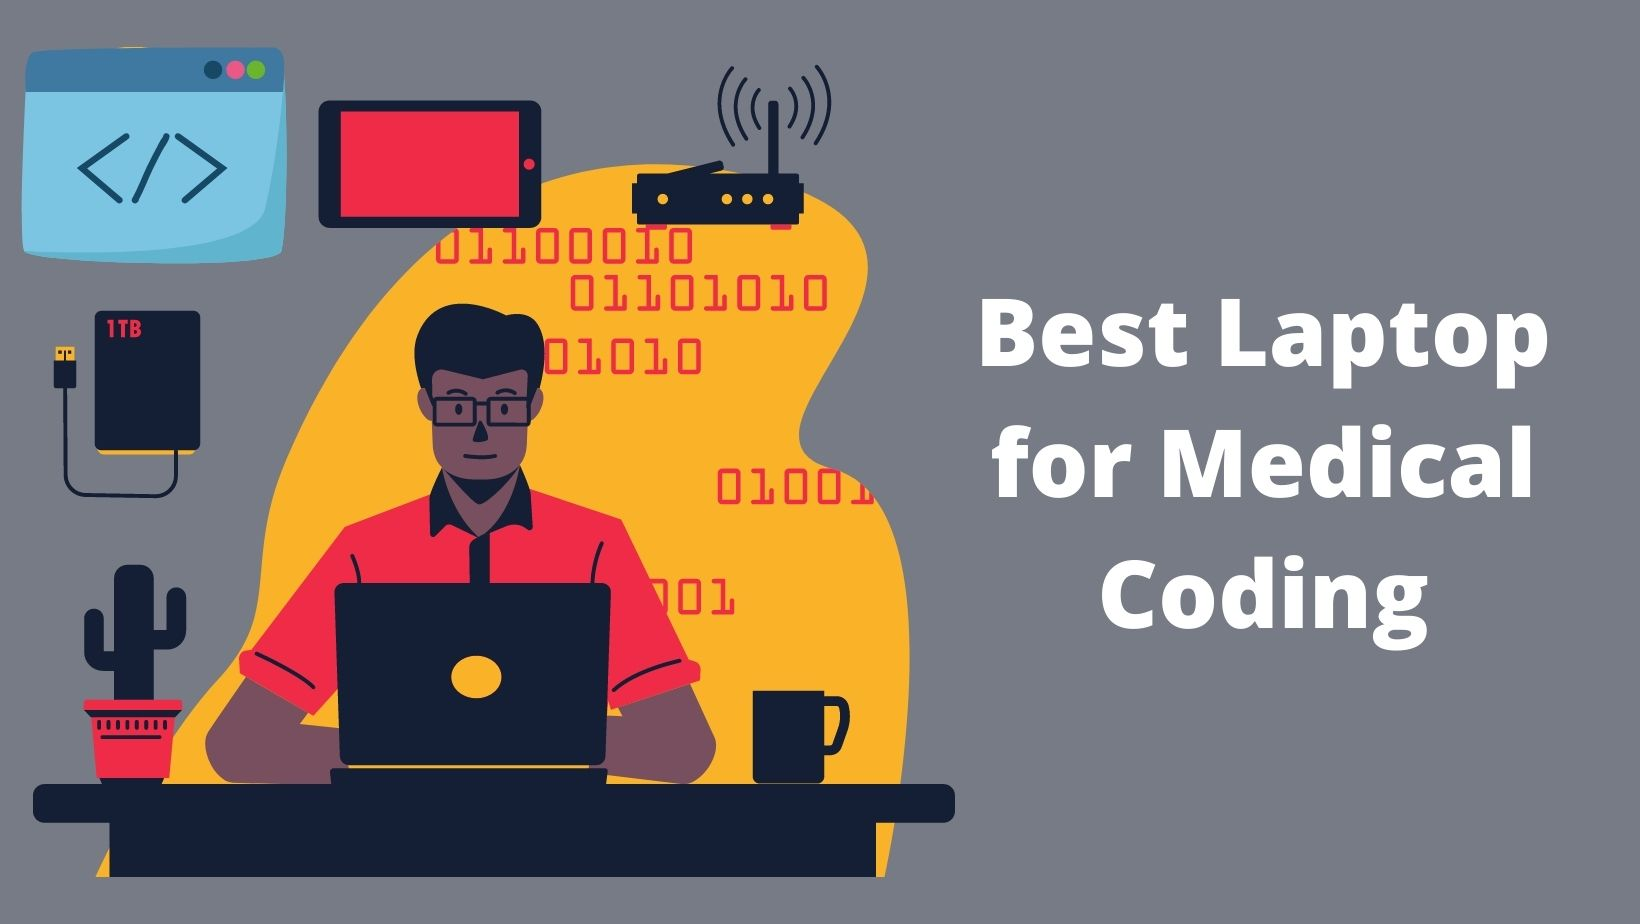 Best Laptop for Medical Coding